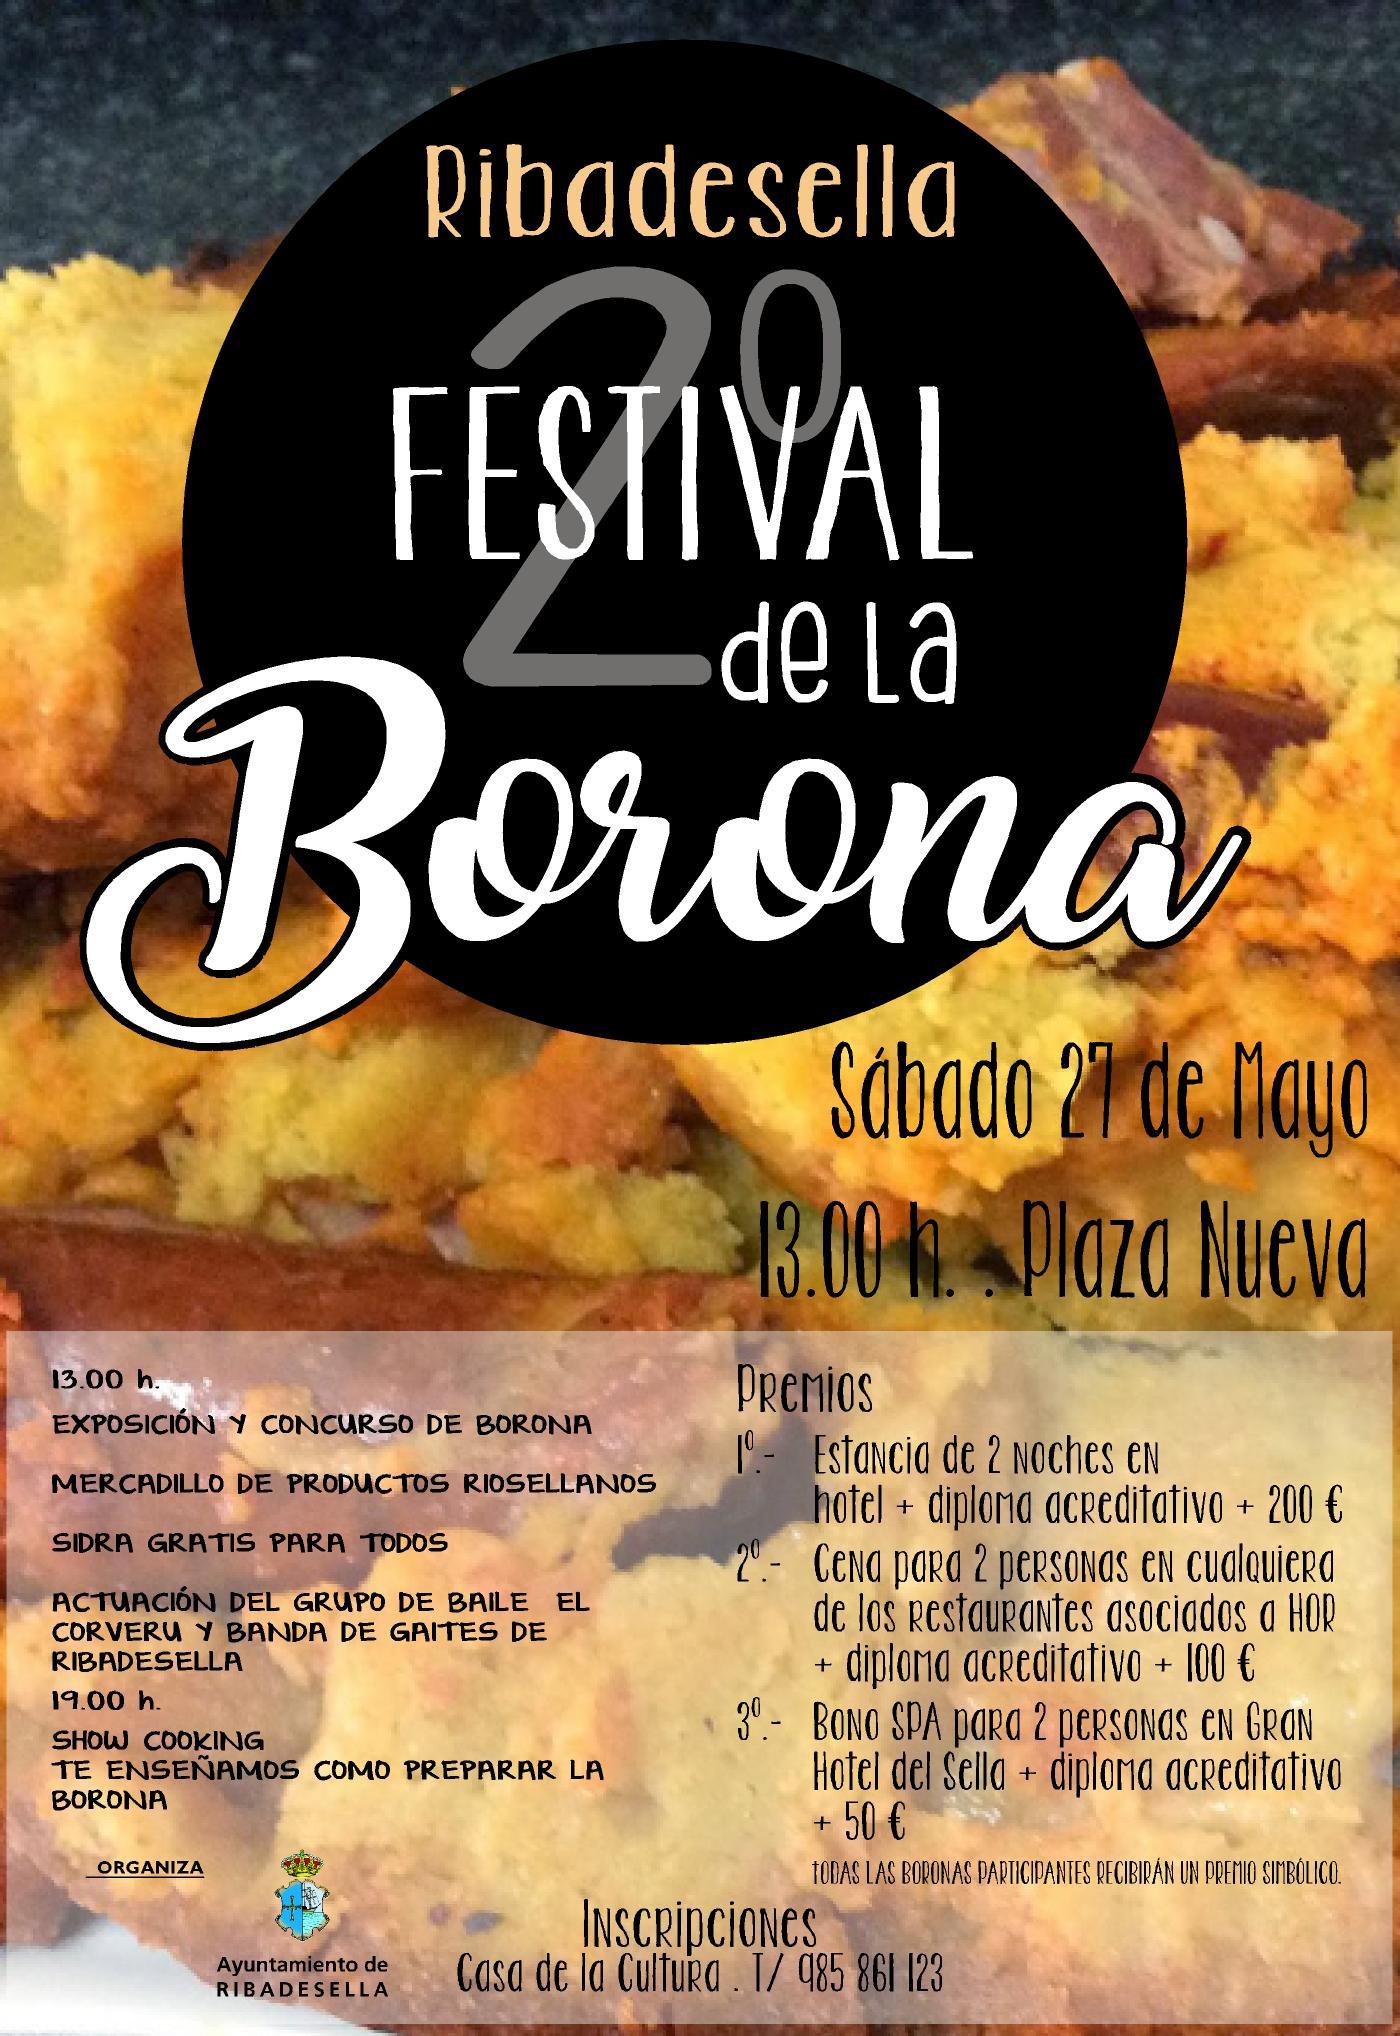 II Festival de la Borona de Ribadesella